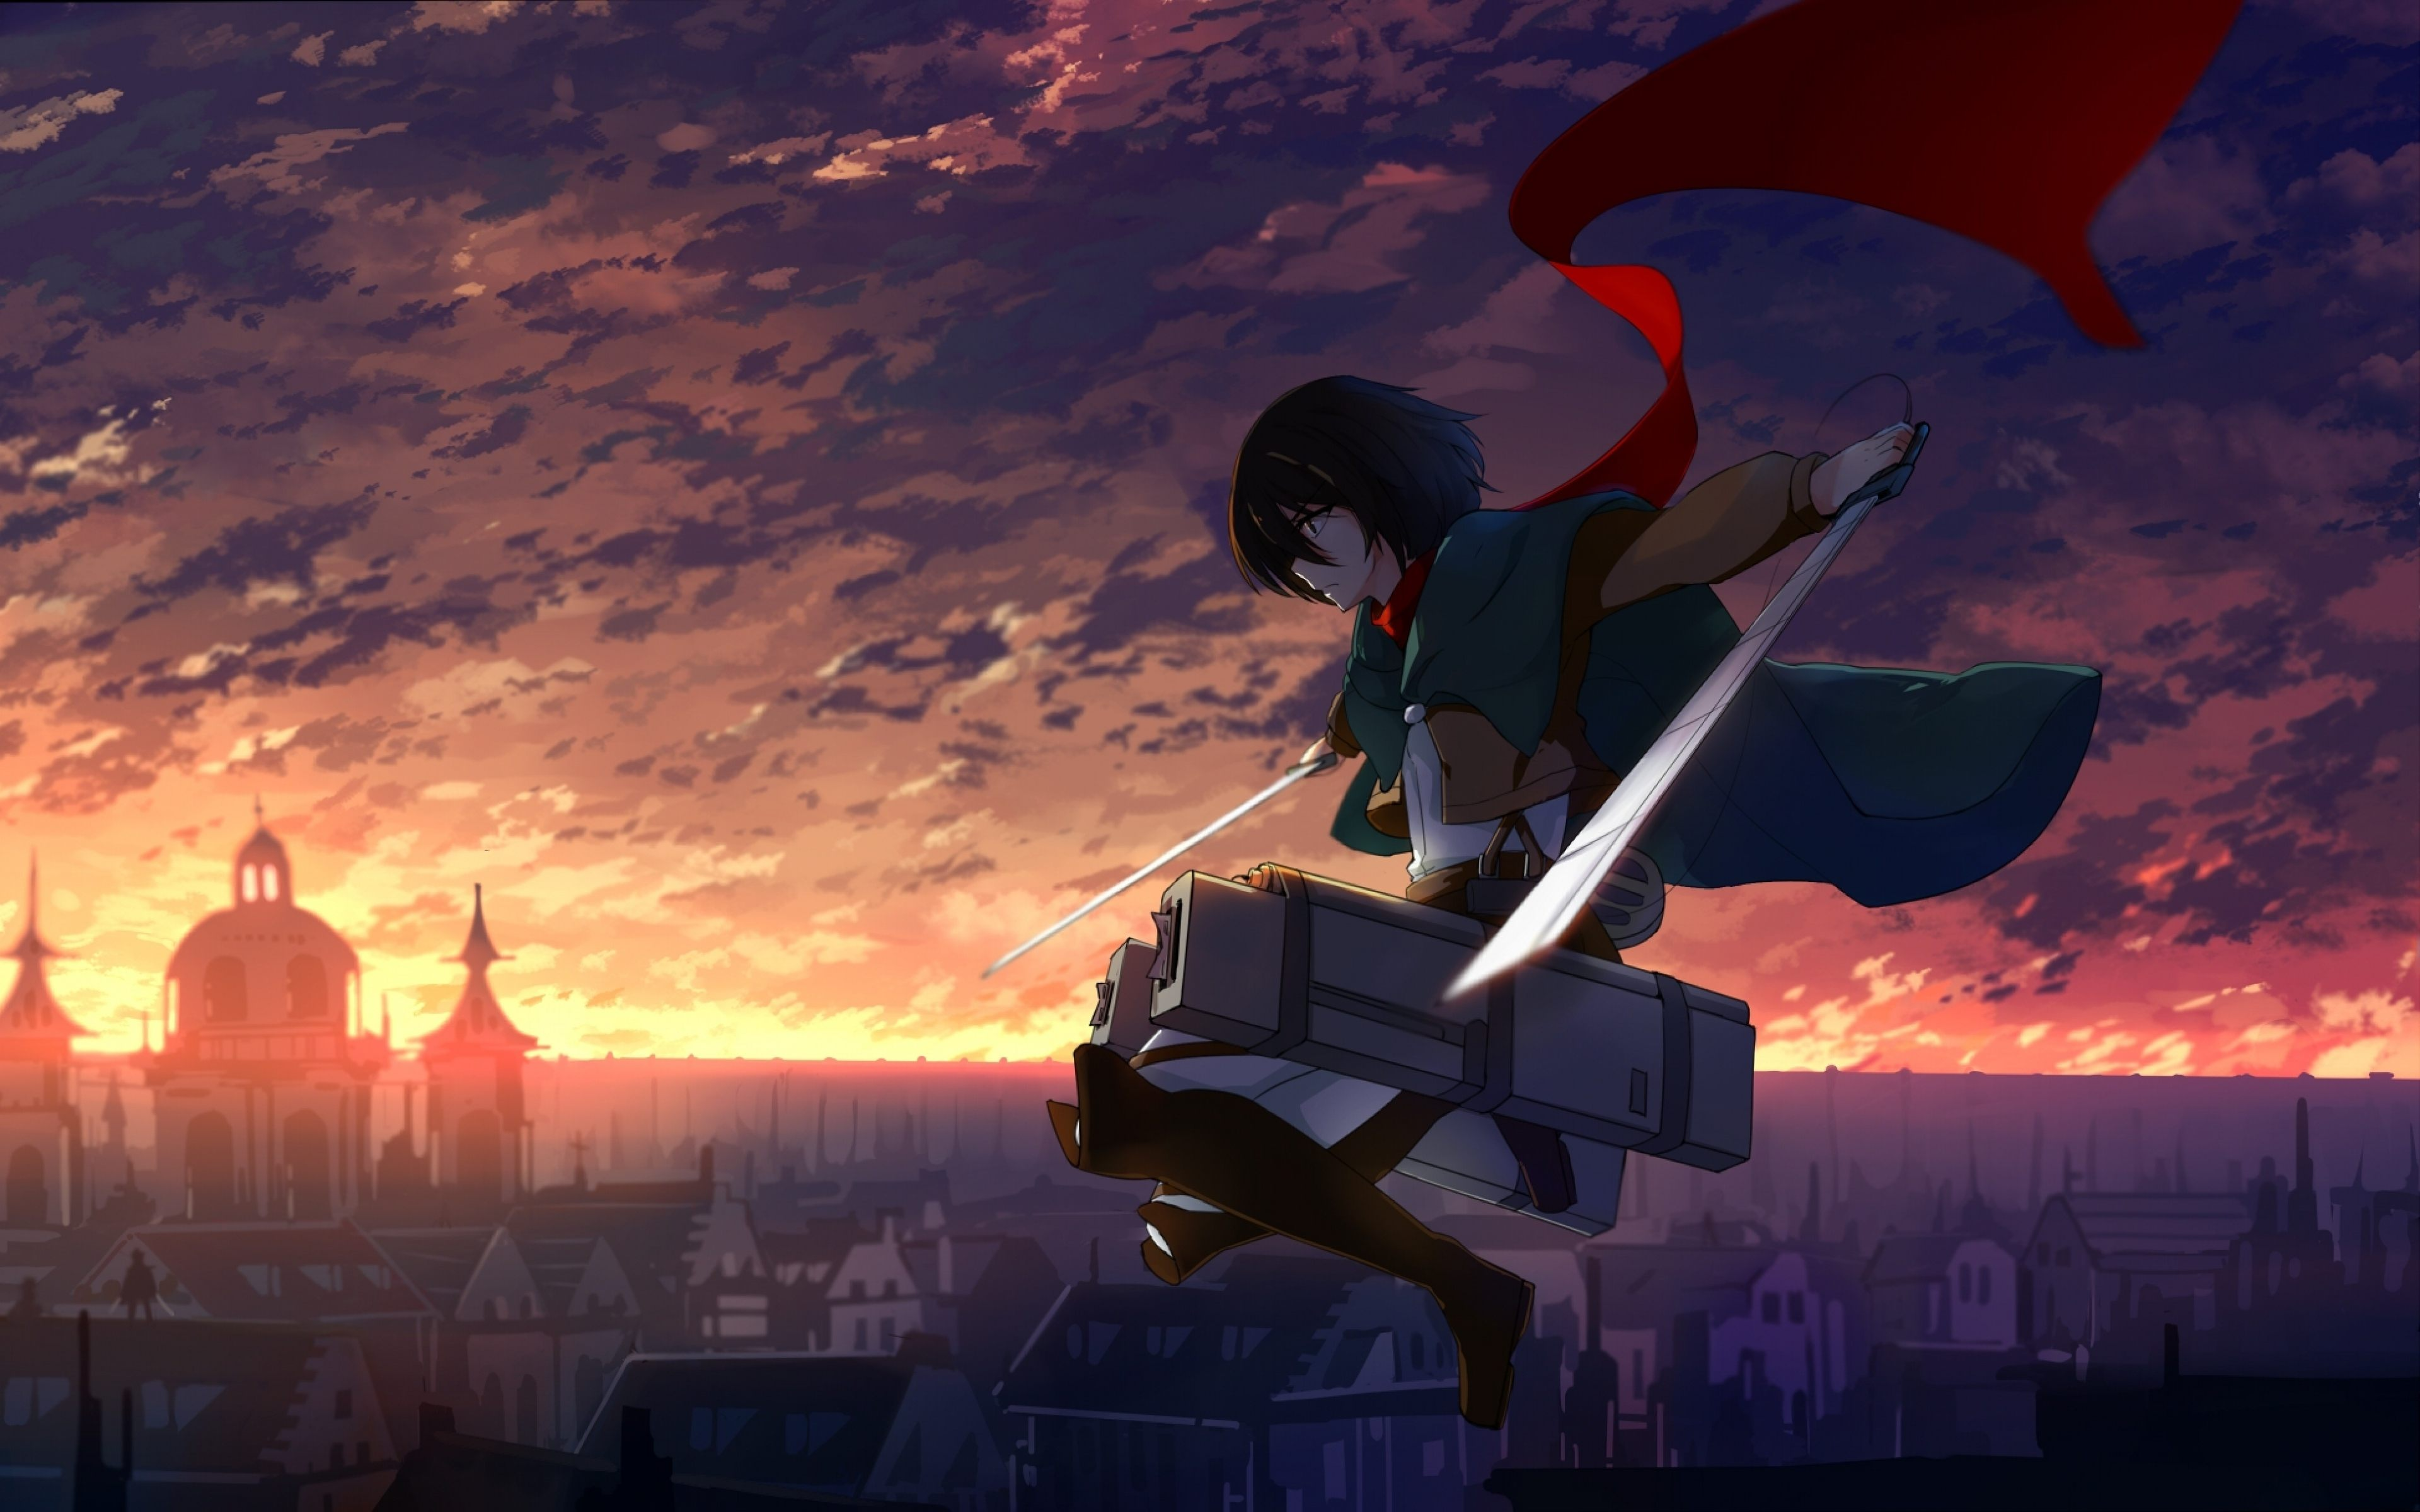 High Resolution Anime Wallpapers 3840x2400 Download Hd Wallpaper Wallpapertip